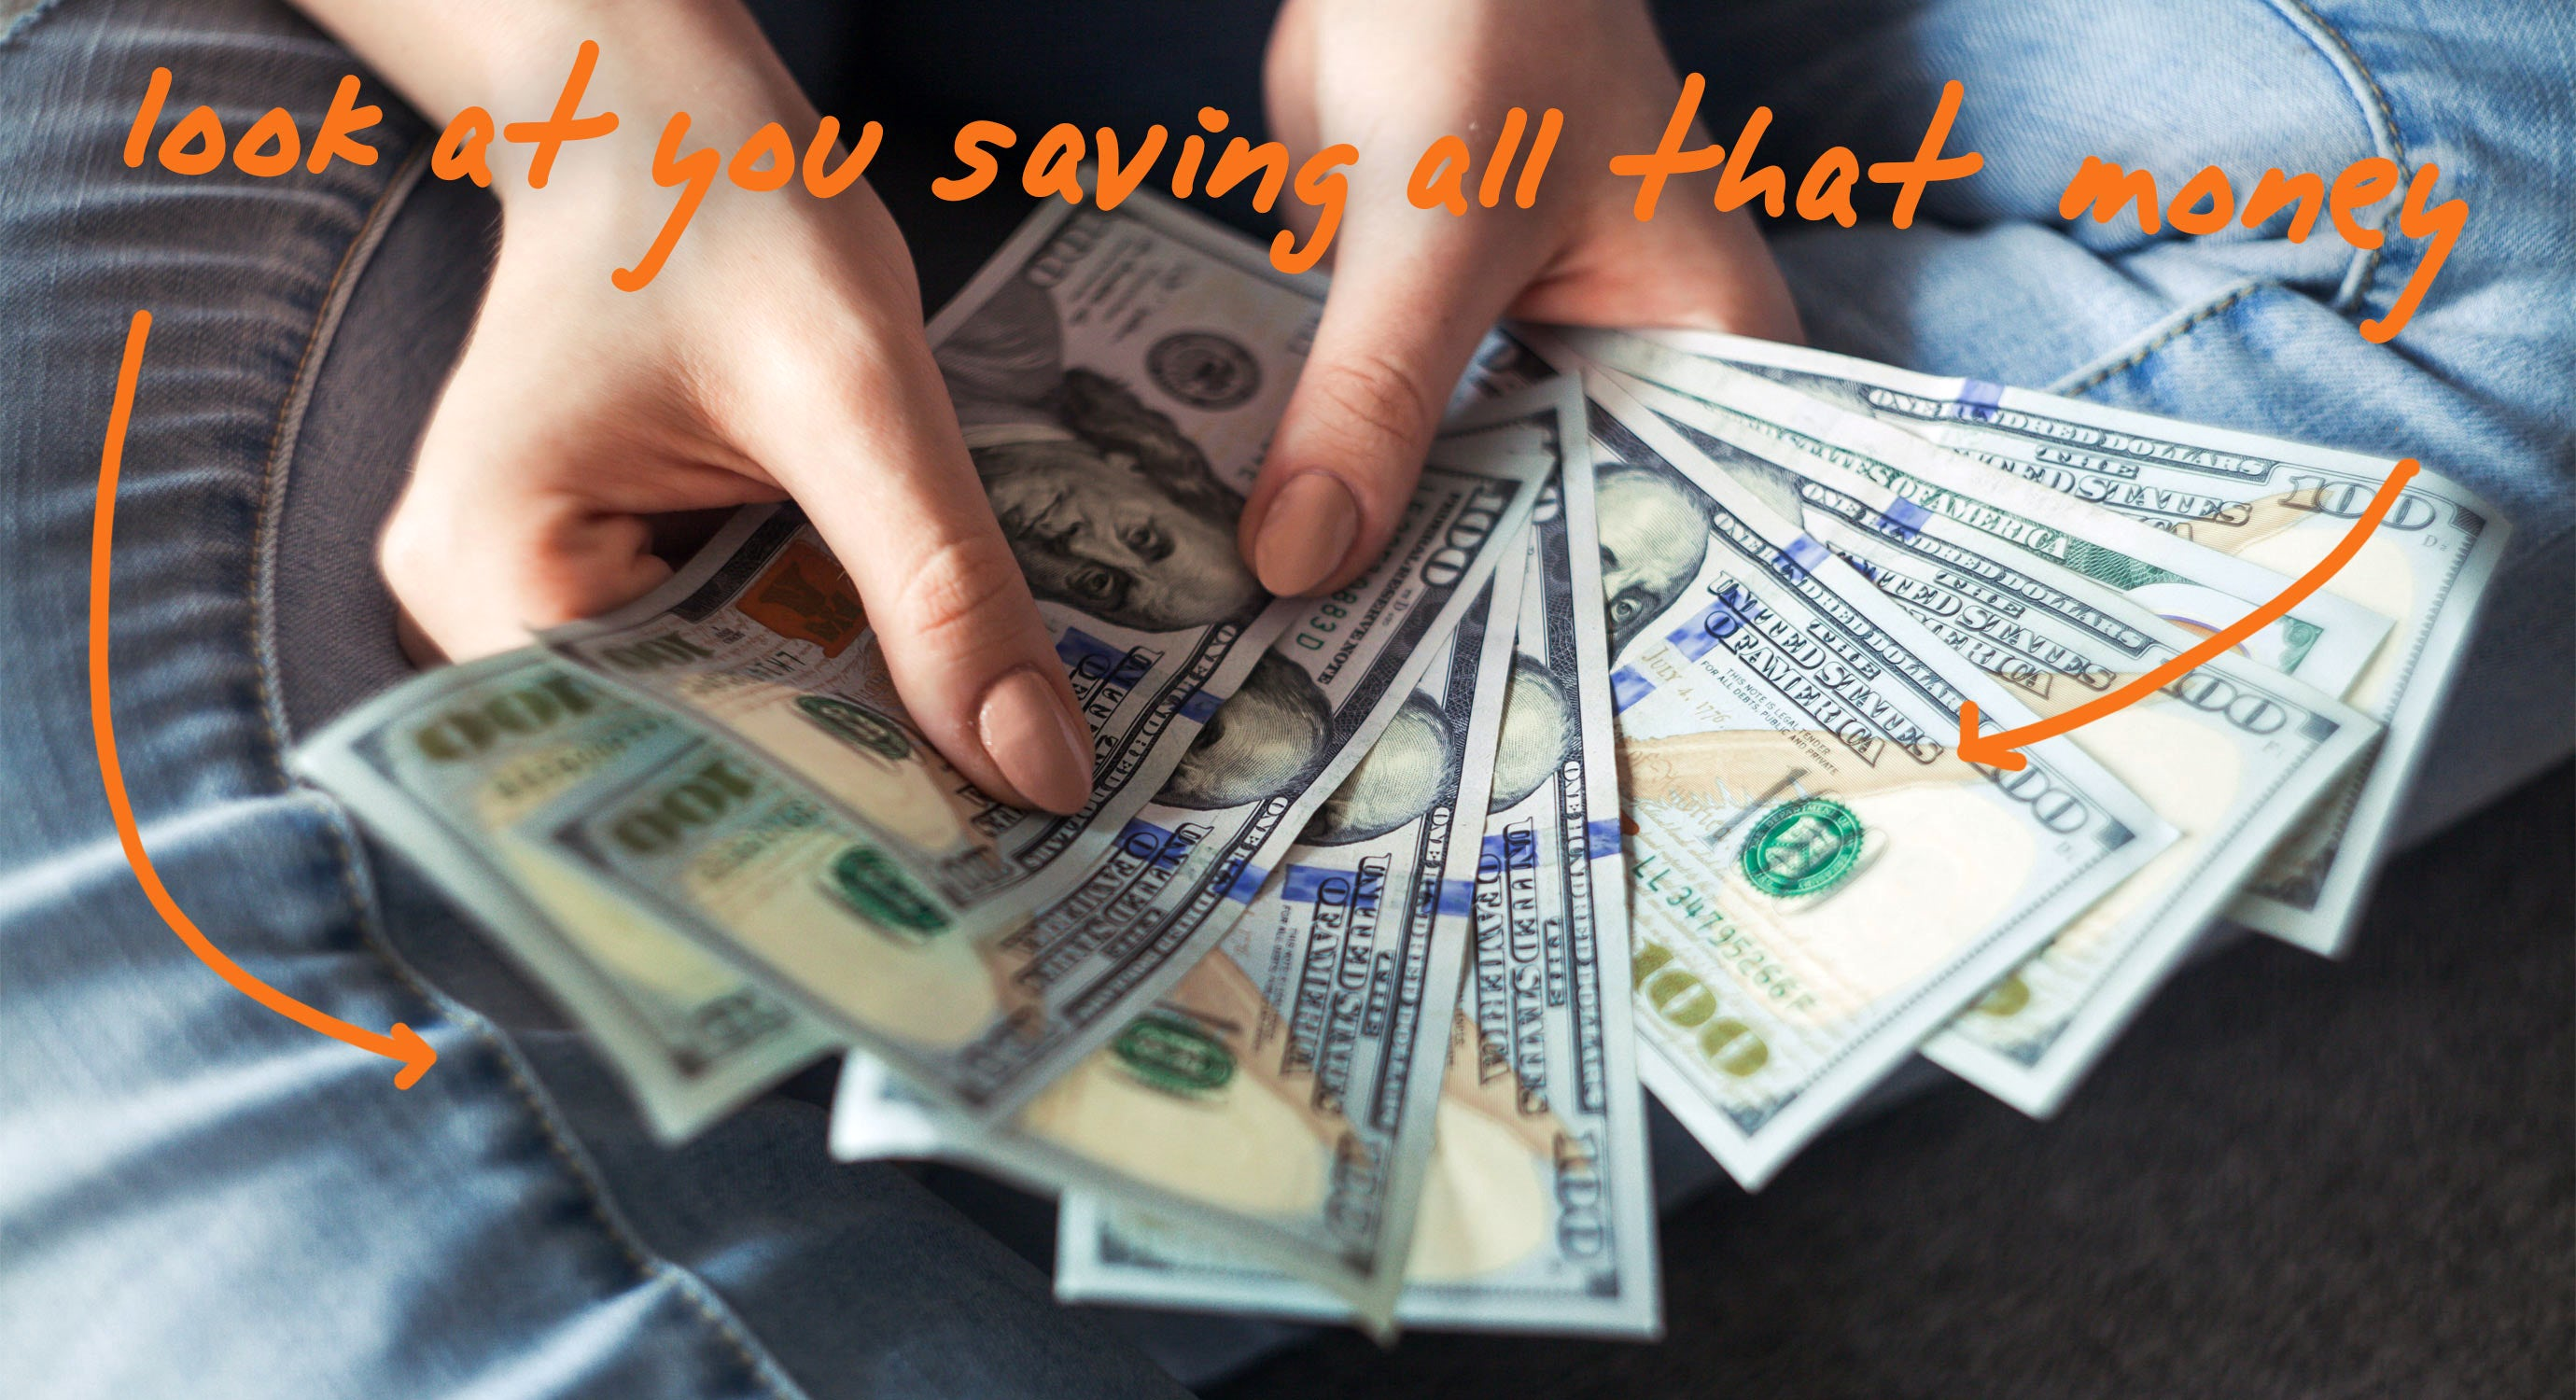 Look it's You Saving Money